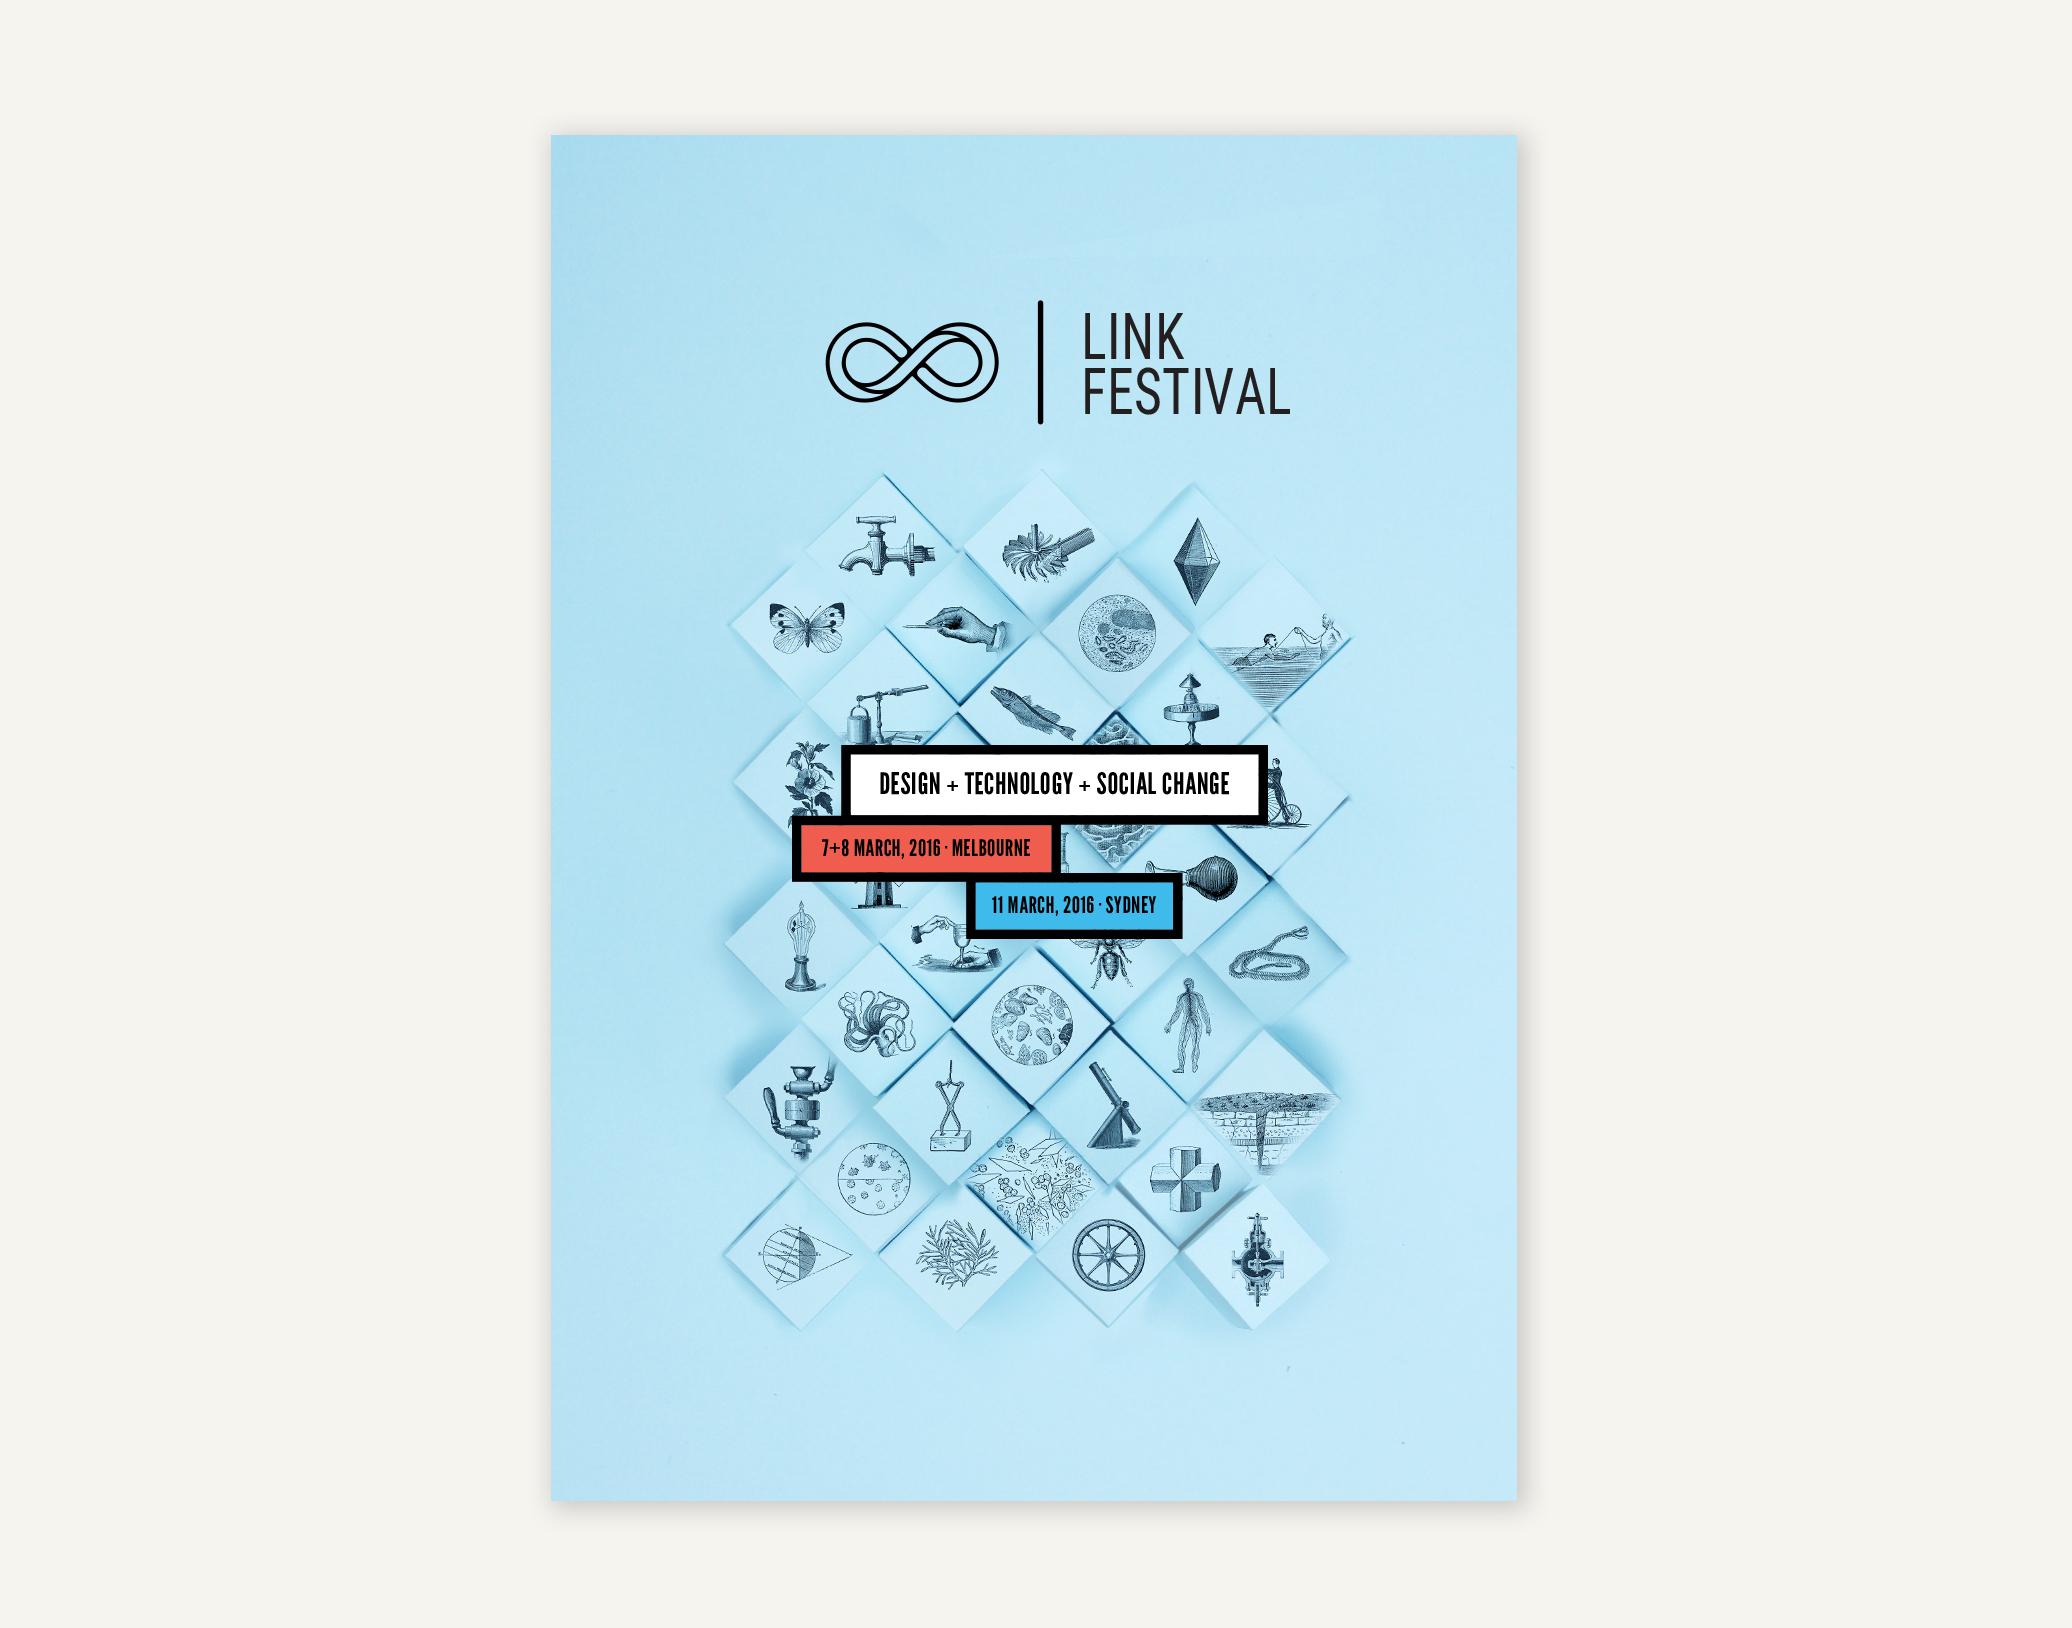 link-festival-concept